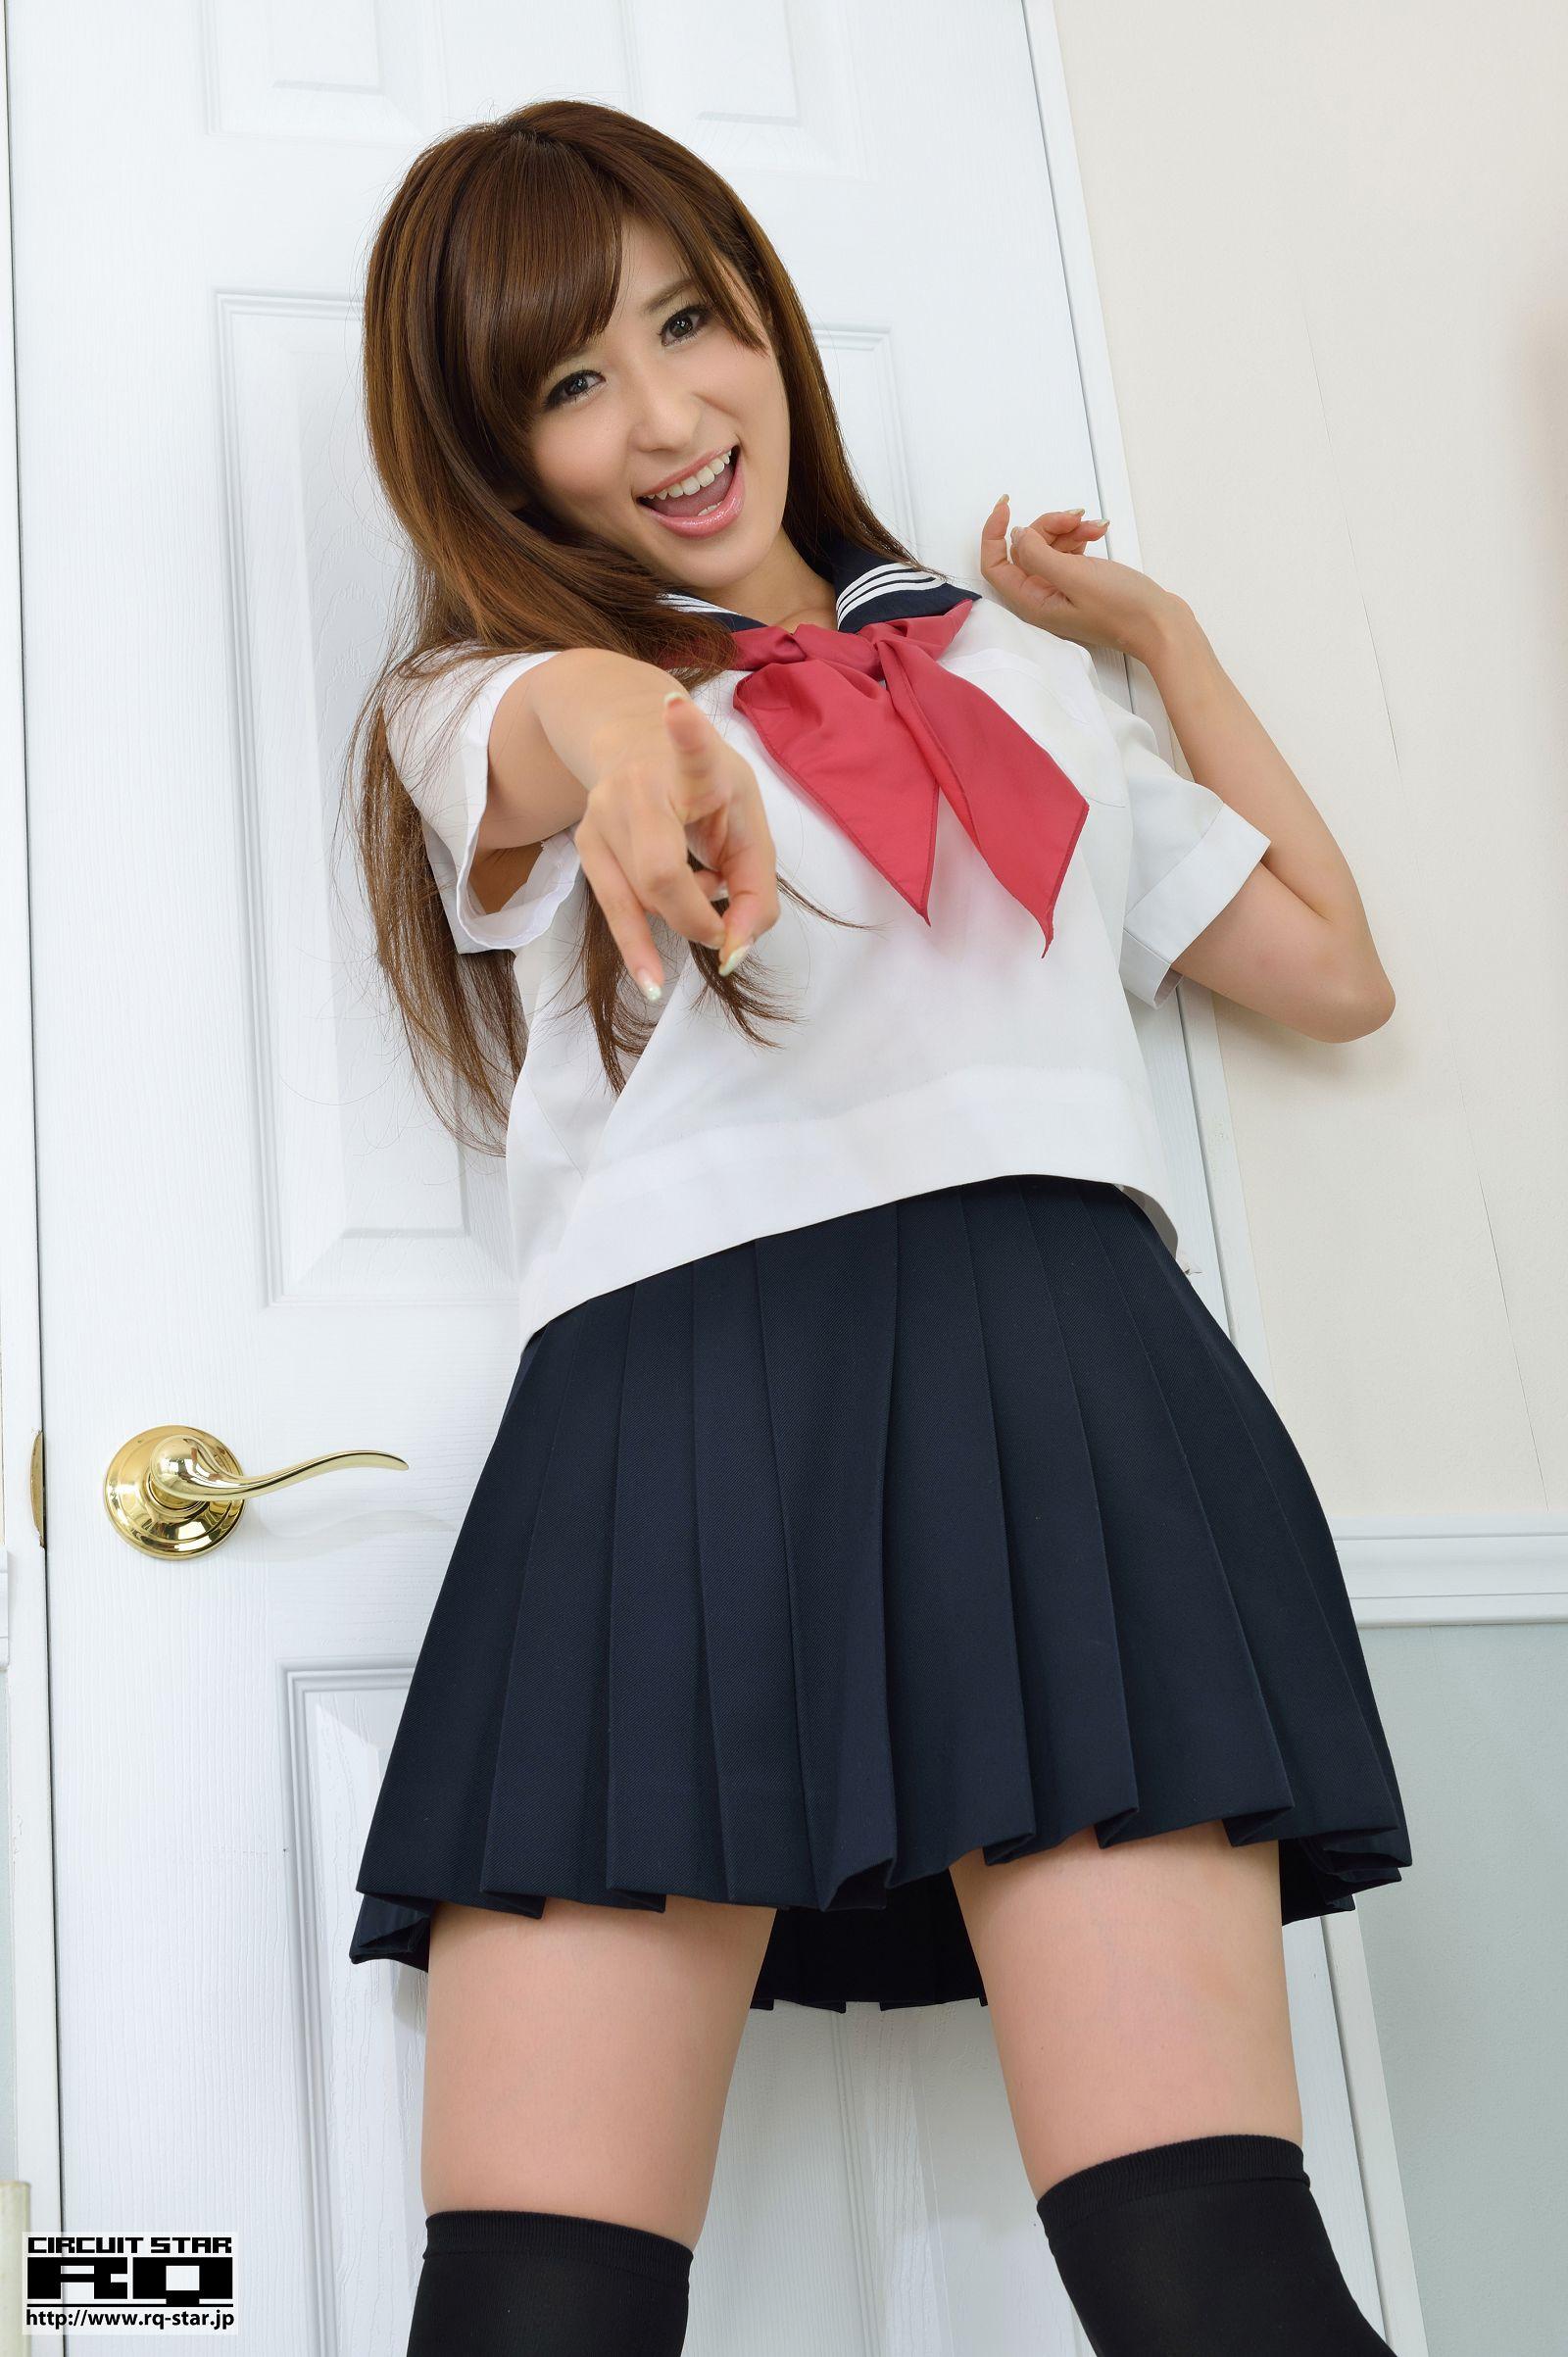 [RQ STAR美女] NO.00684 Ayaka Arima 有馬綾香 Sailor[125P] RQ STAR 第2张